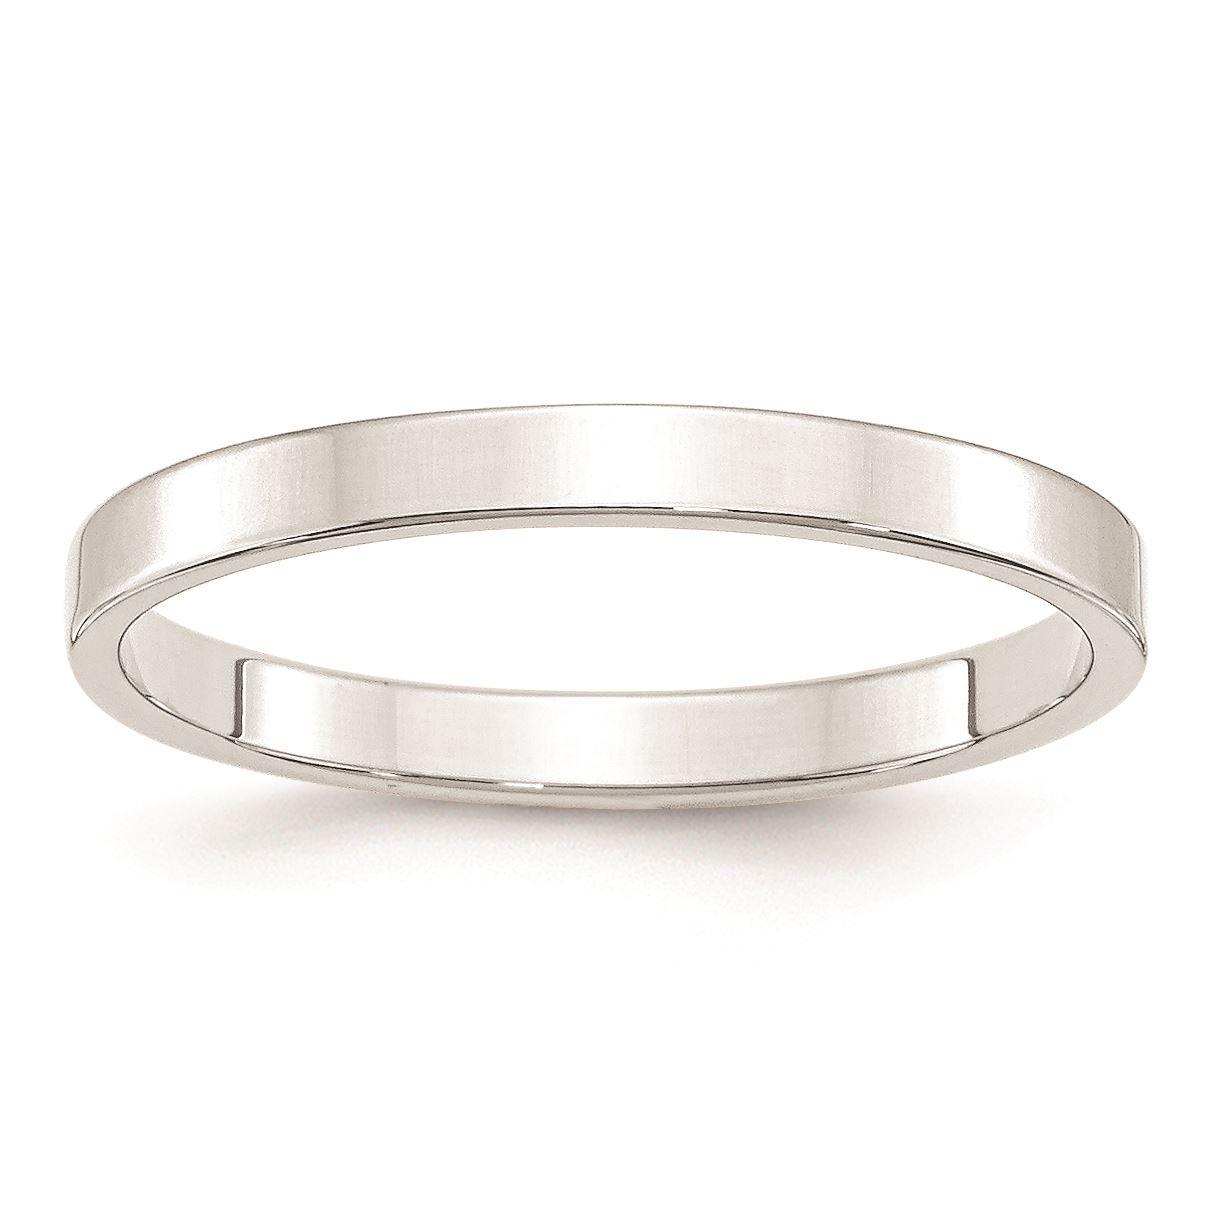 14K White Gold 2.5mm Half Round Light Band